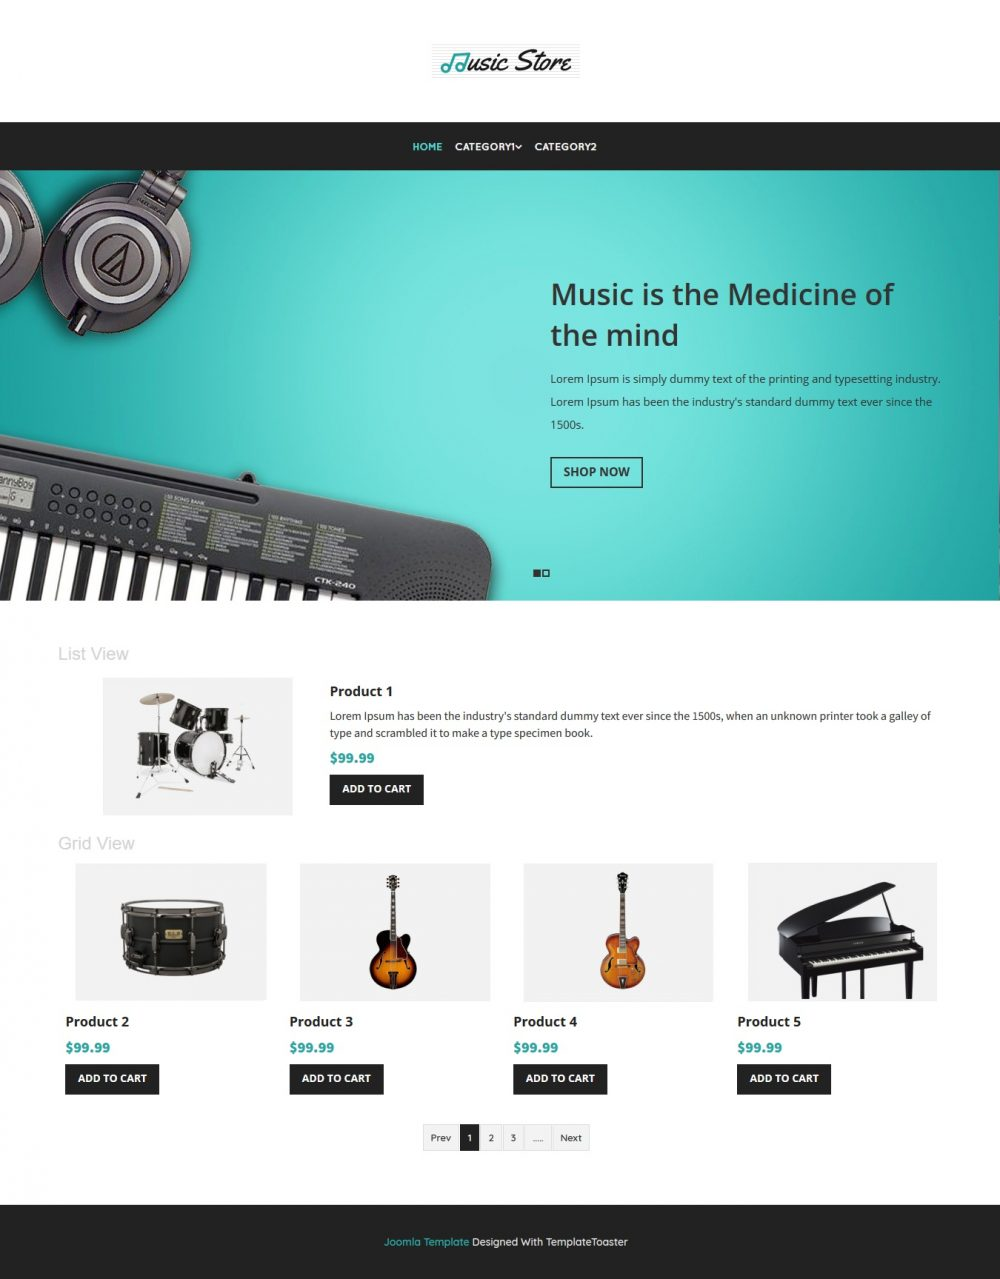 Music Instruments Store virtuemart template